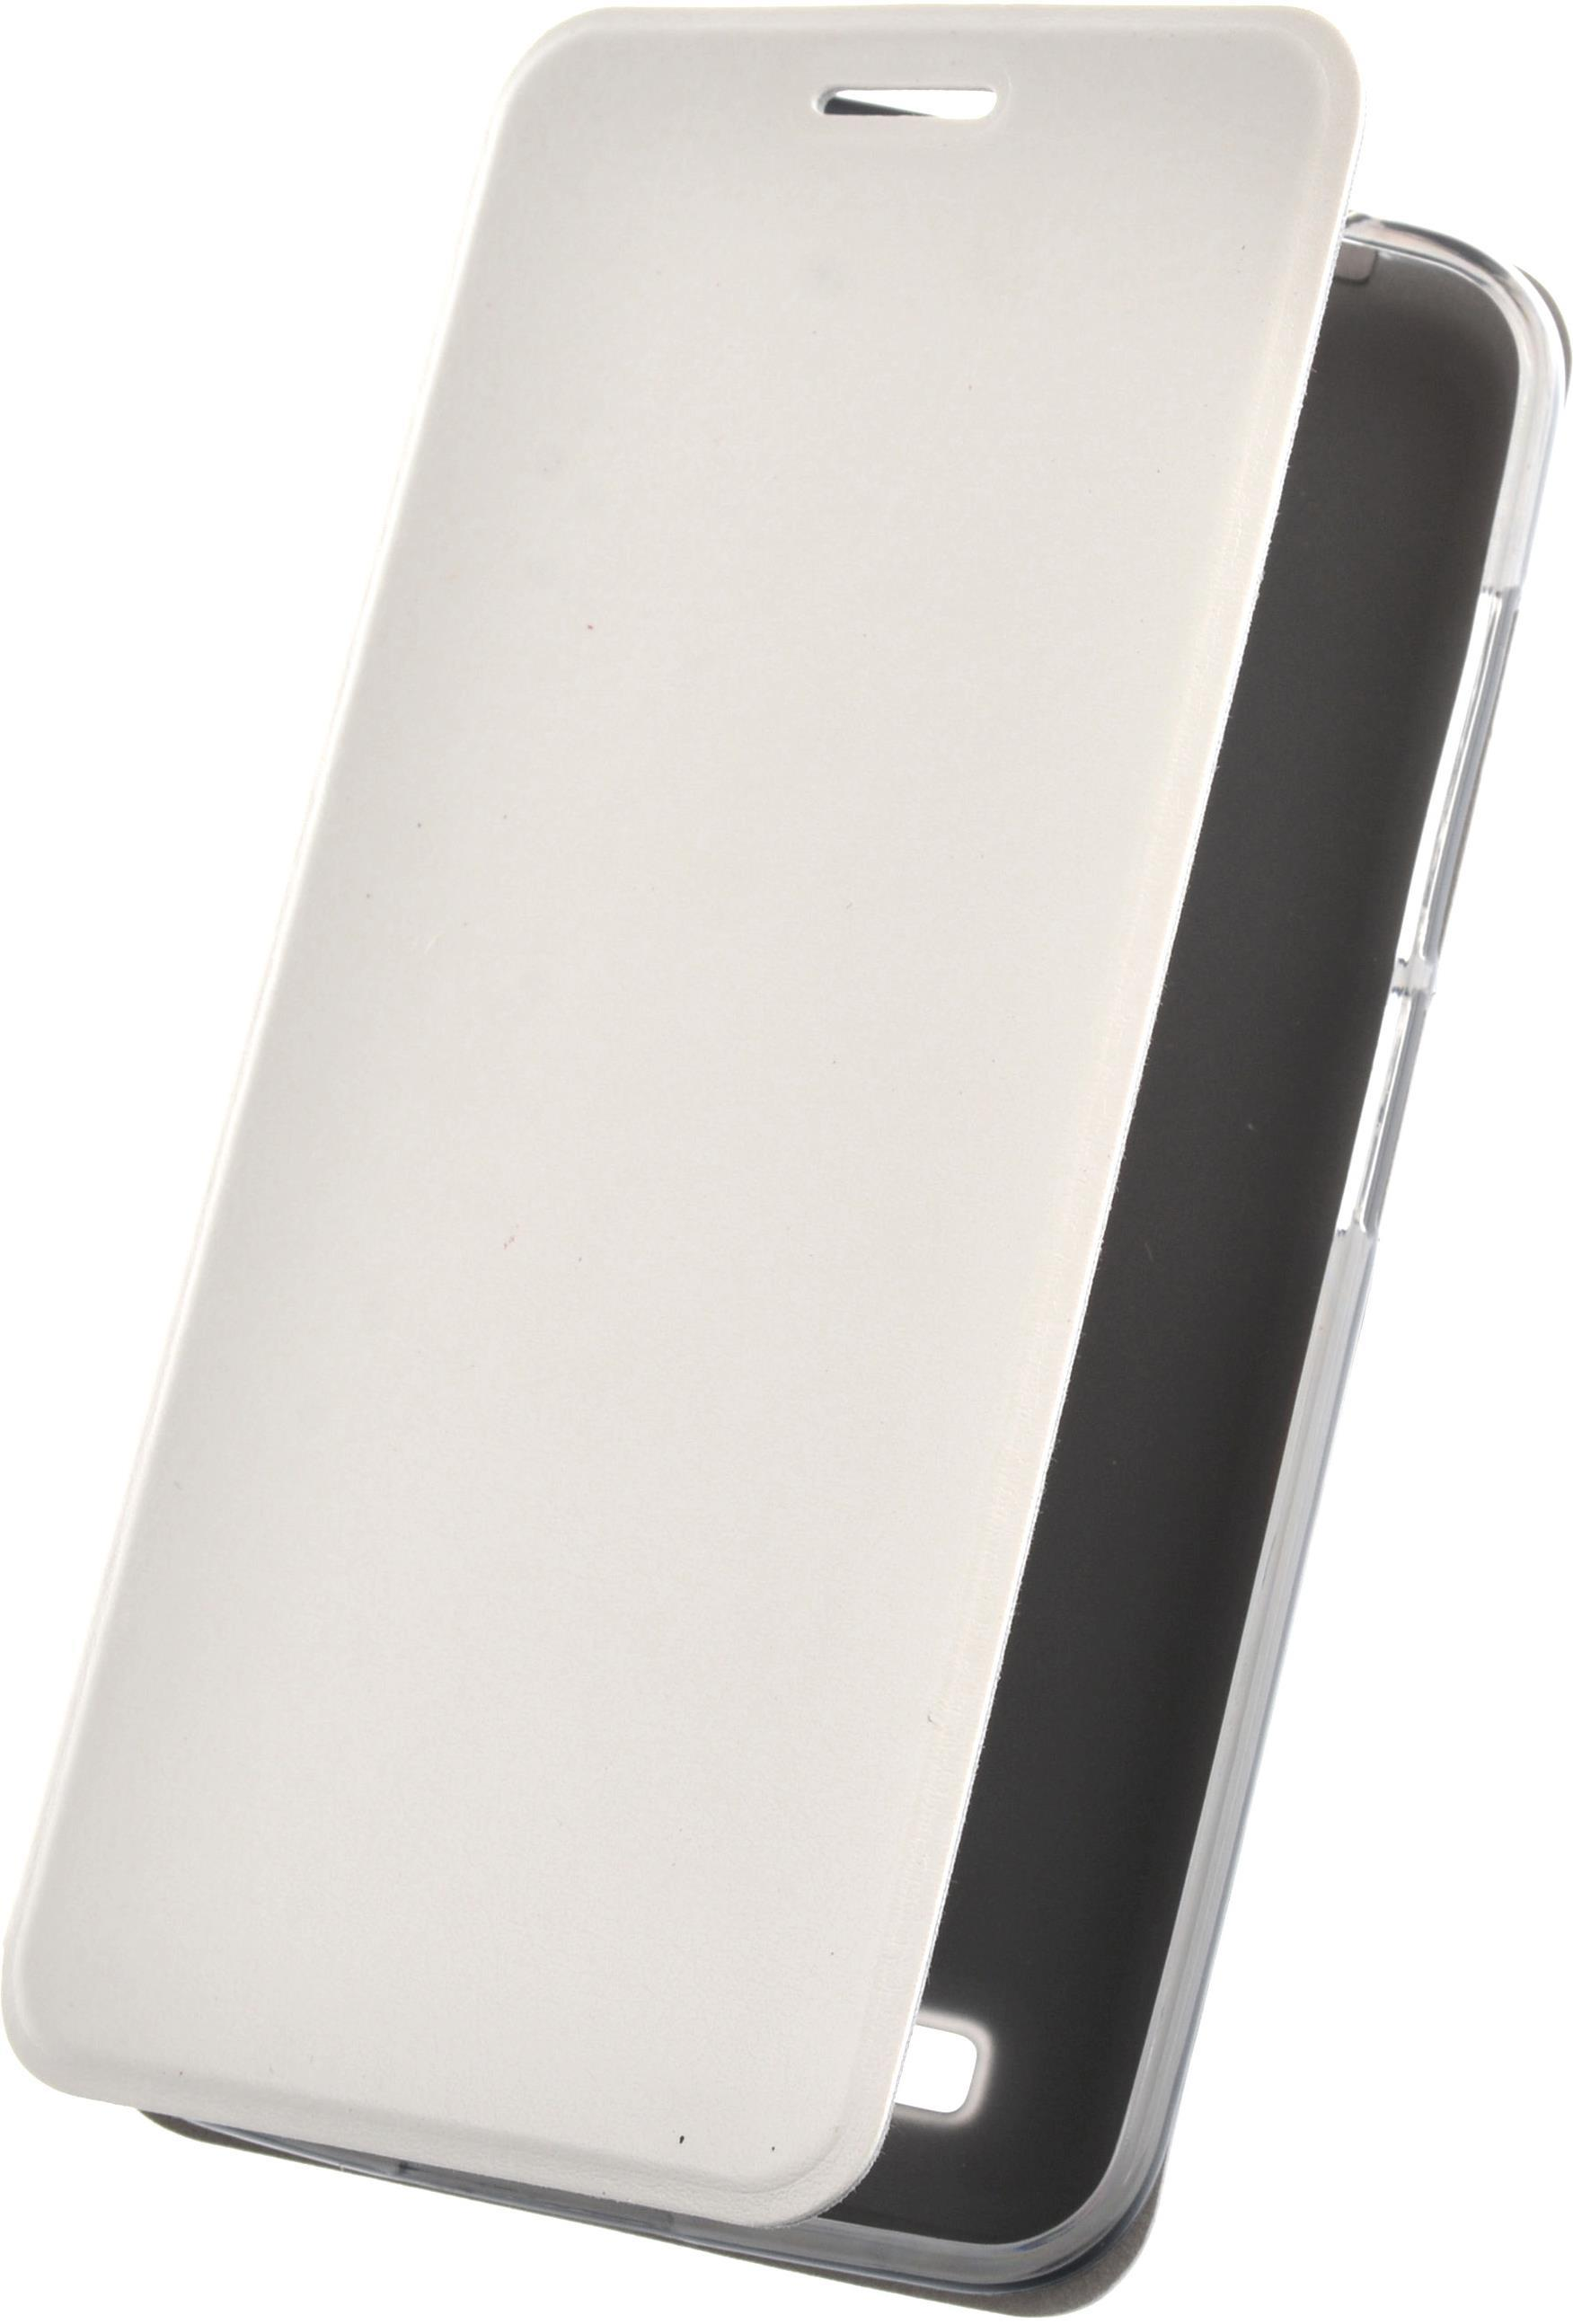 Чехол skinBOX Lux для Asus ZenFone Go ZC500TG белый